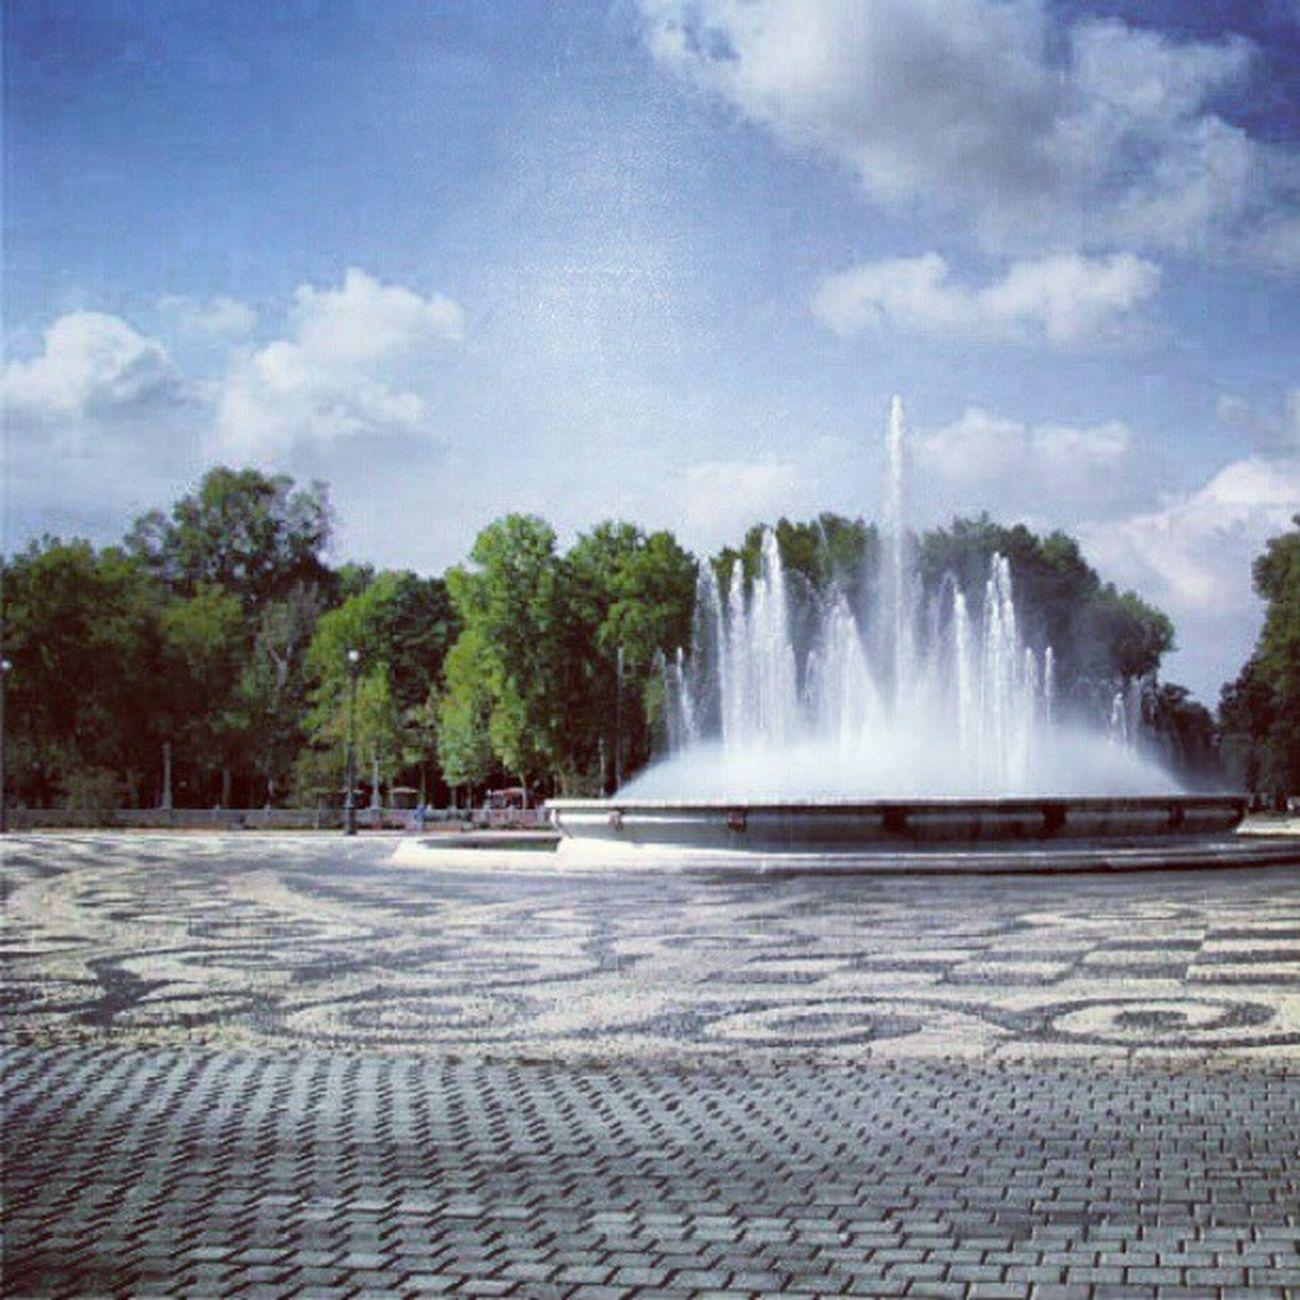 Plaza de Espana, Seville, Andalusia Igersgreece Instamood Instalovers Instaholic instahub instapic instadaily igersspain instacool instagood instagramers instafamous igdaily instalovers_gr spain plaza sky blue fountain